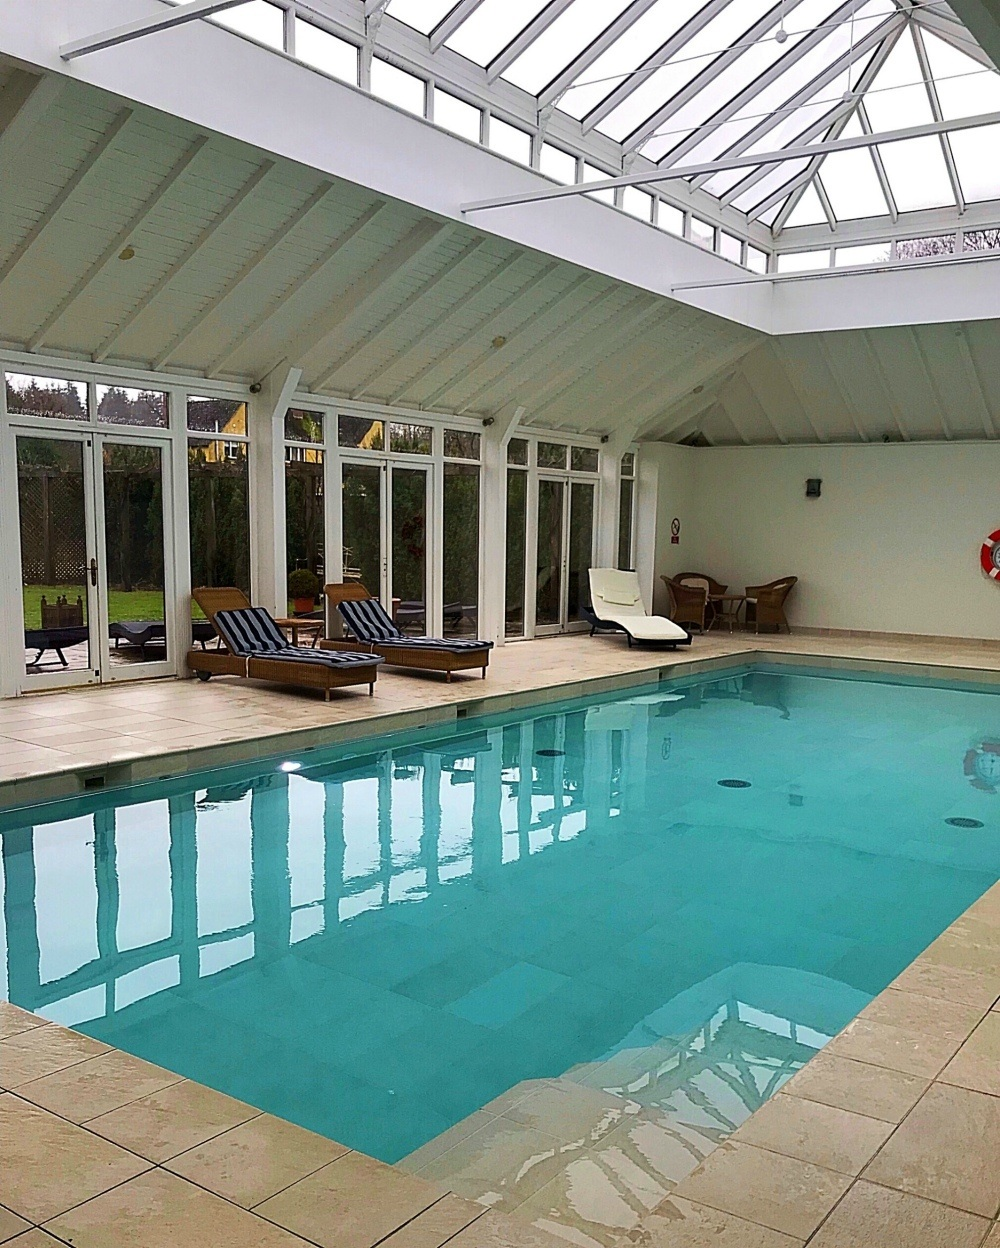 Swimming Pool at Bruern Cottages - Photo Heatheronhertravels.com